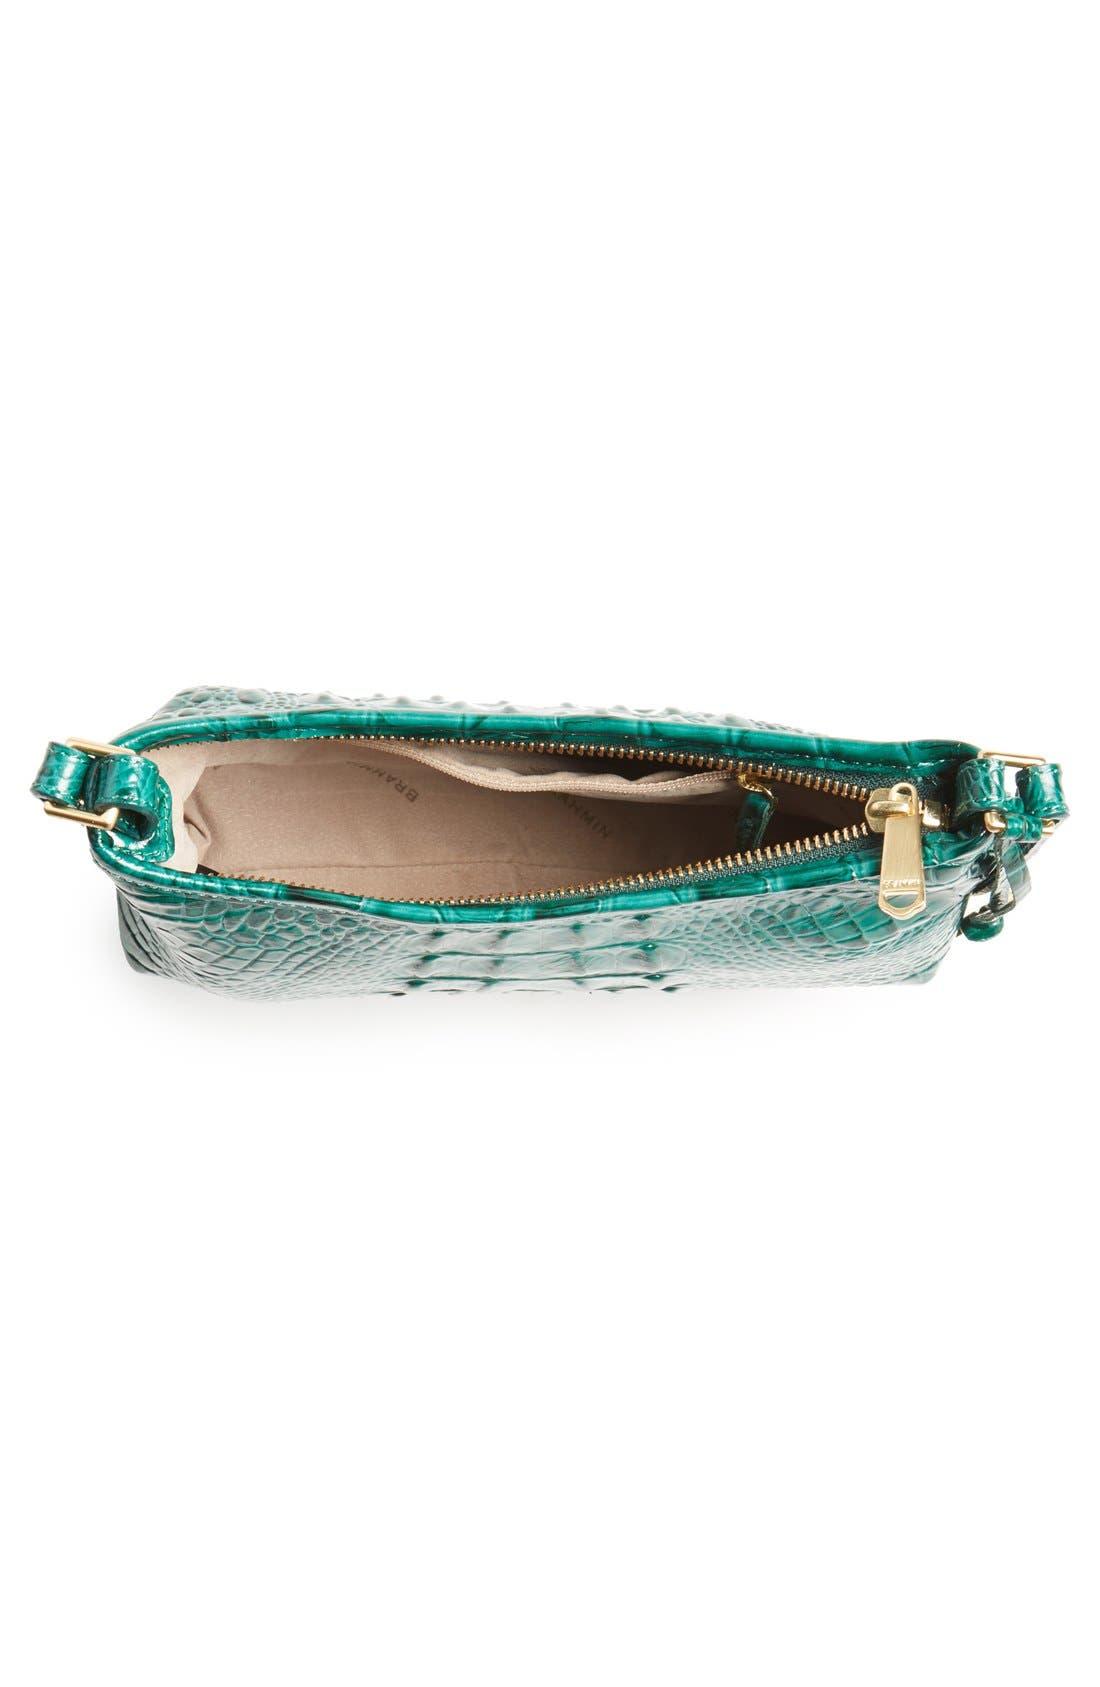 'Anytime - Mini' Convertible Handbag,                             Alternate thumbnail 33, color,